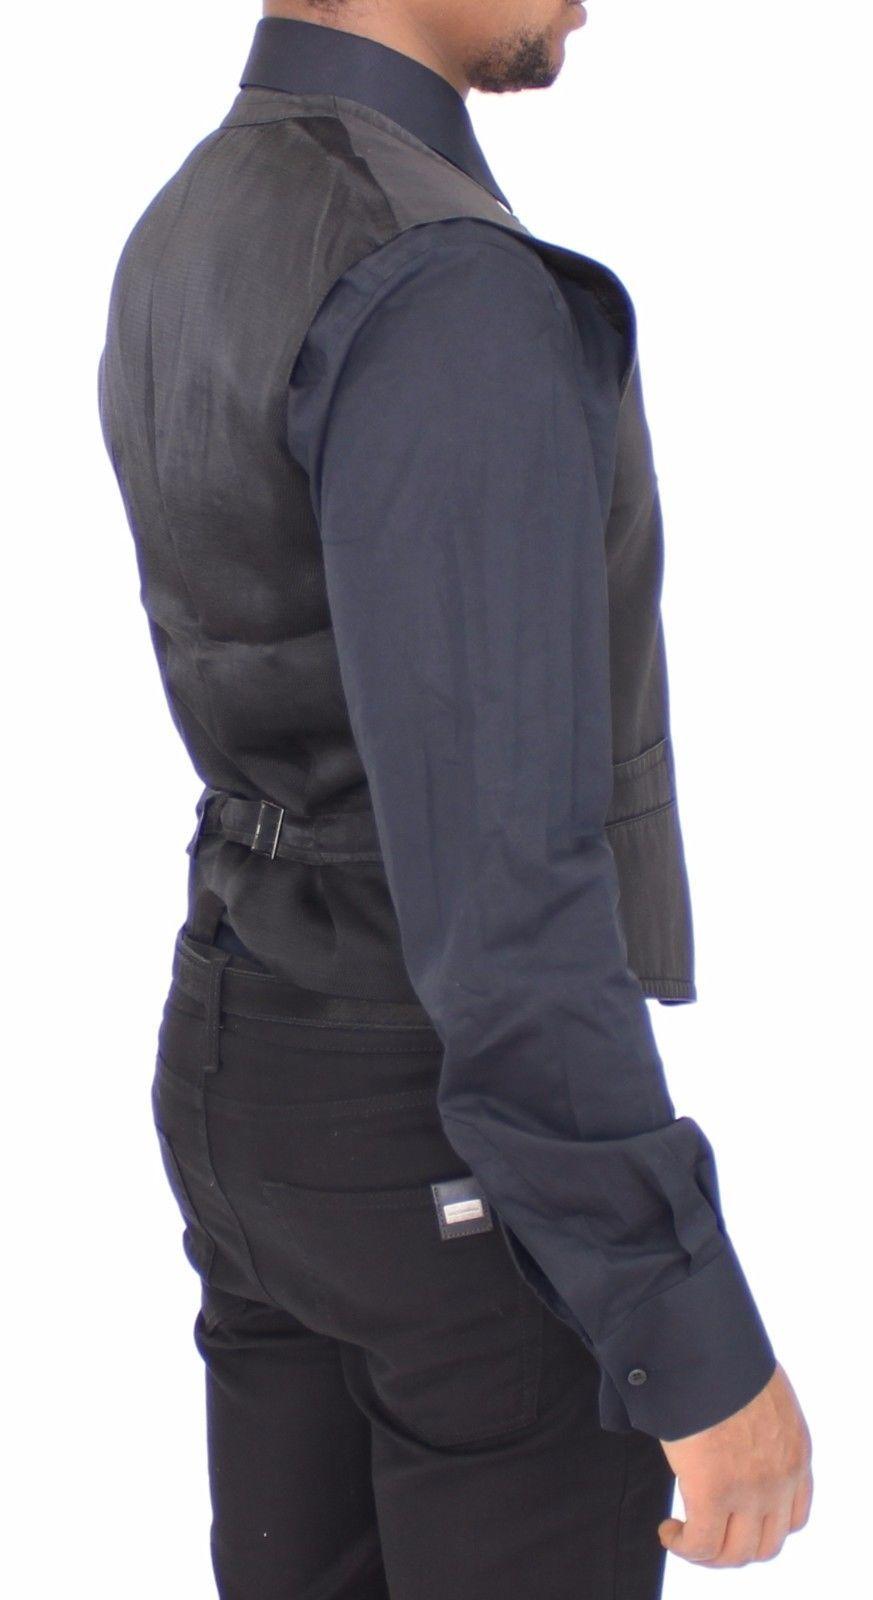 Dolce & Gabbana Black Cotton Blend Dress Vest Gilet